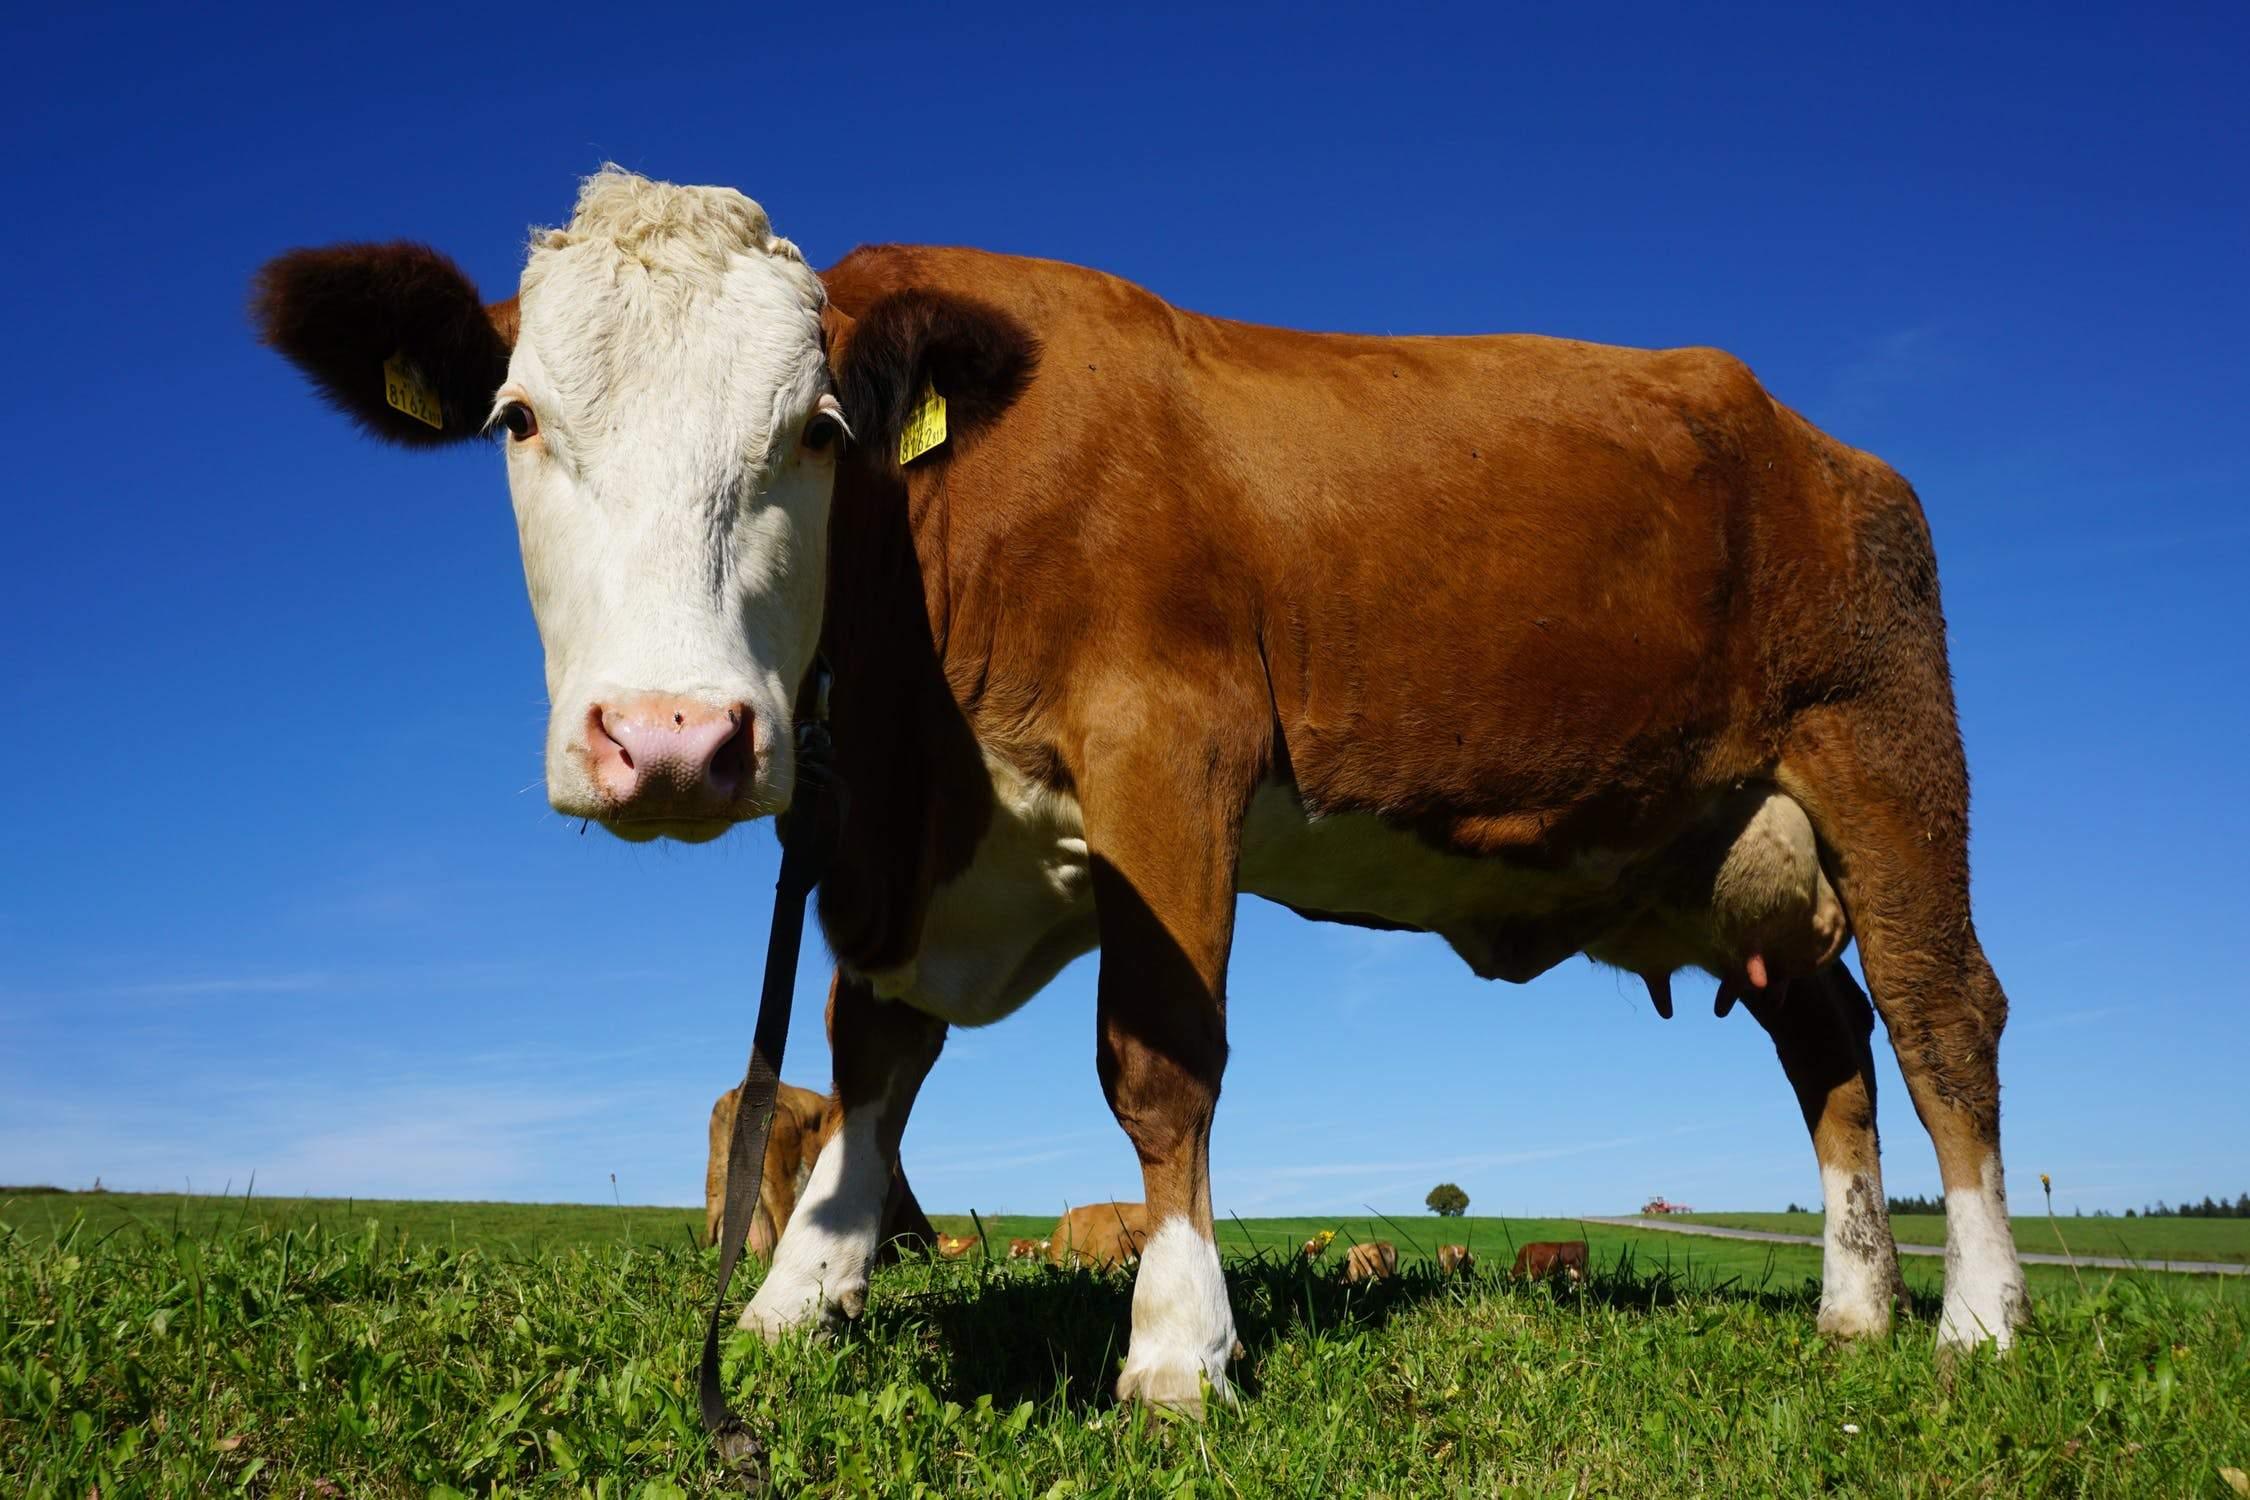 China lifts 20-year ban on exports of British beef – creating £250m market